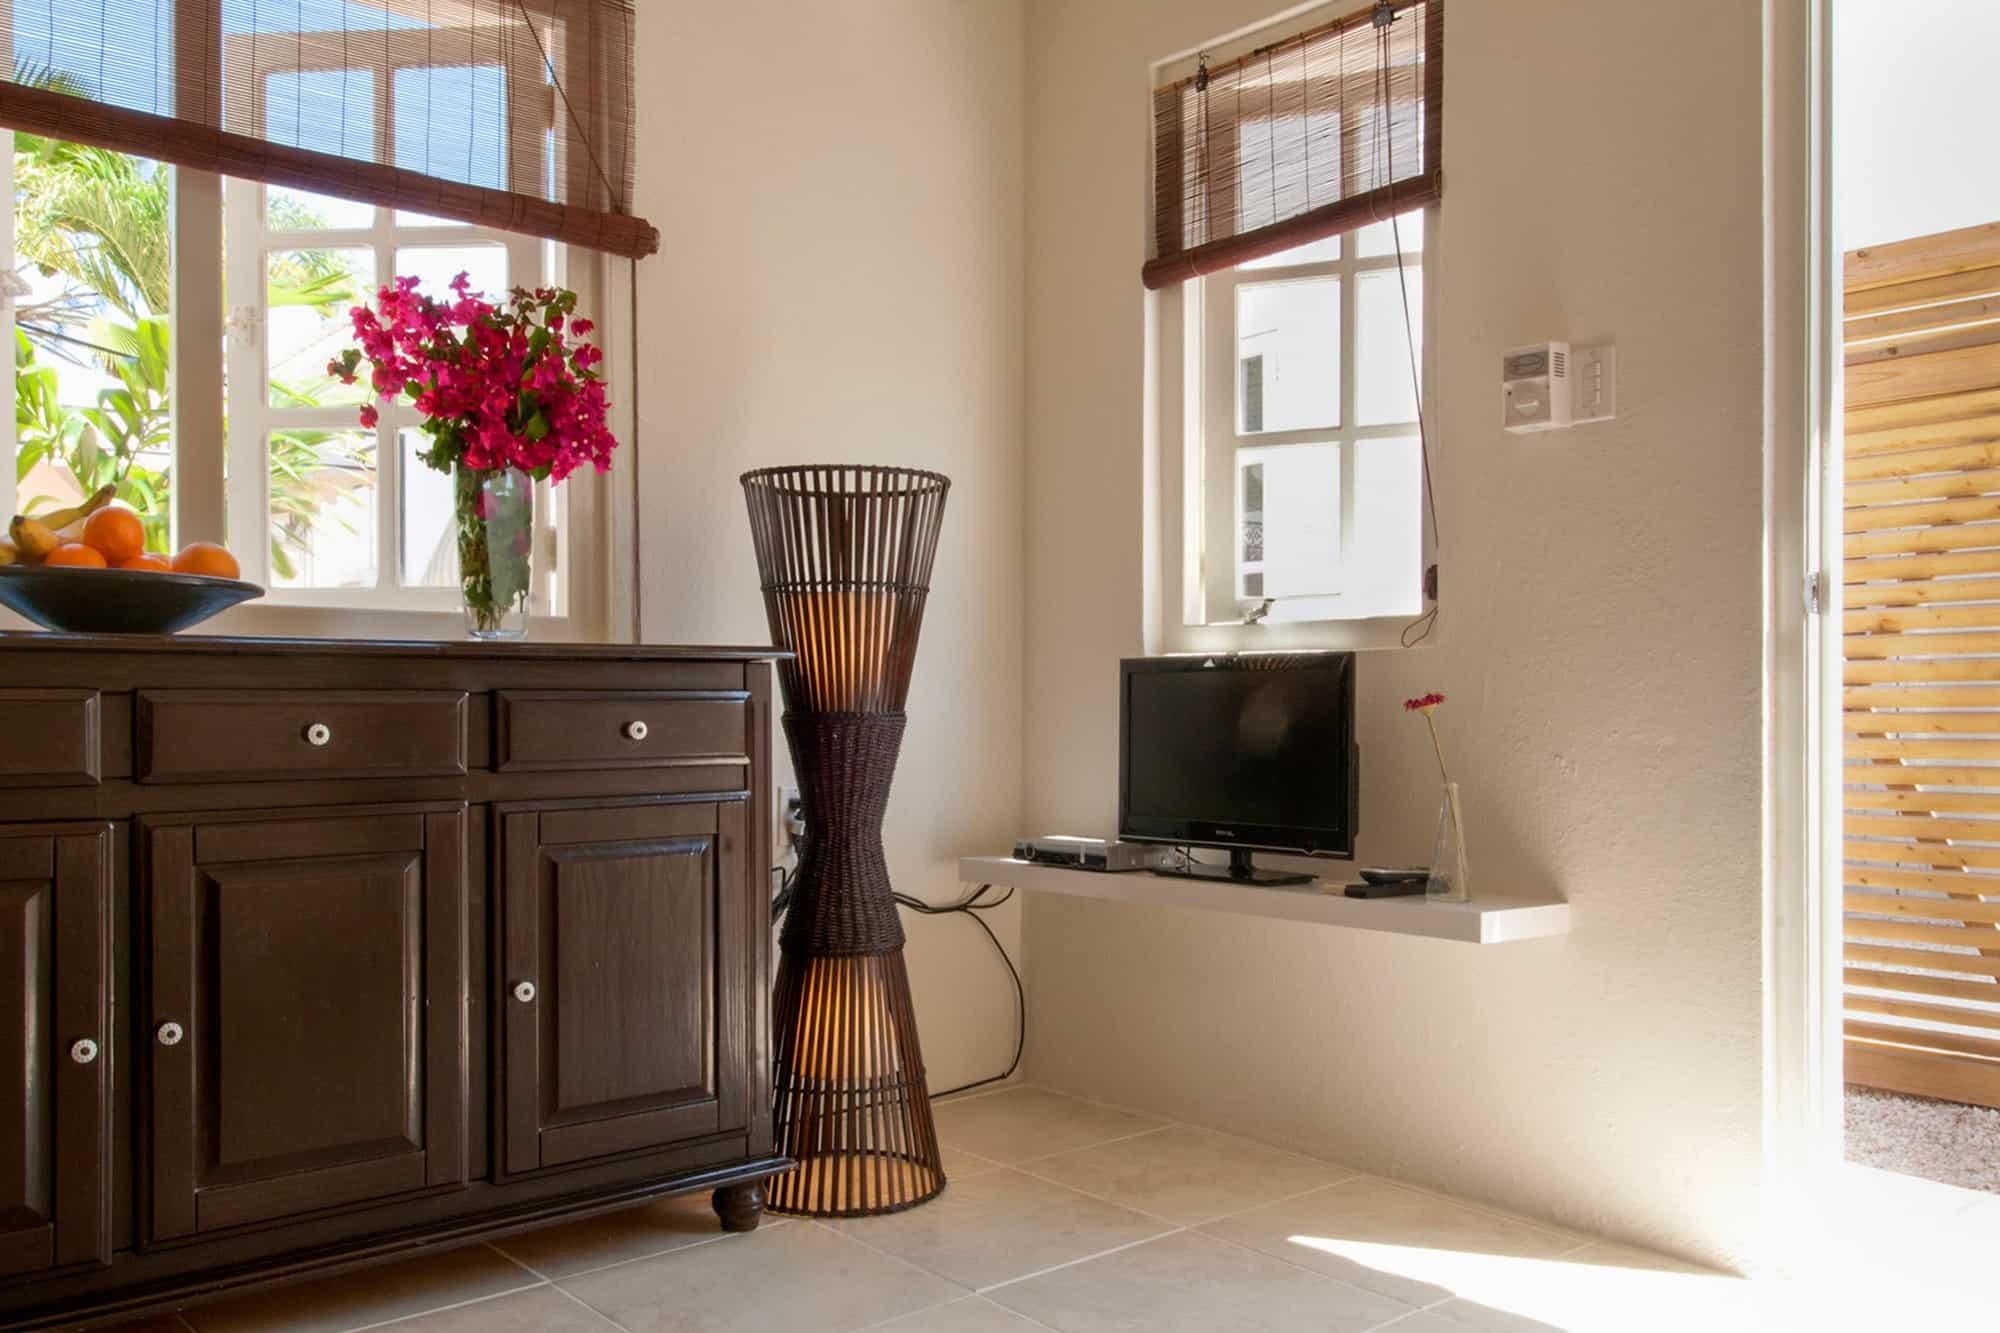 Appartement Trupial Woonkamer